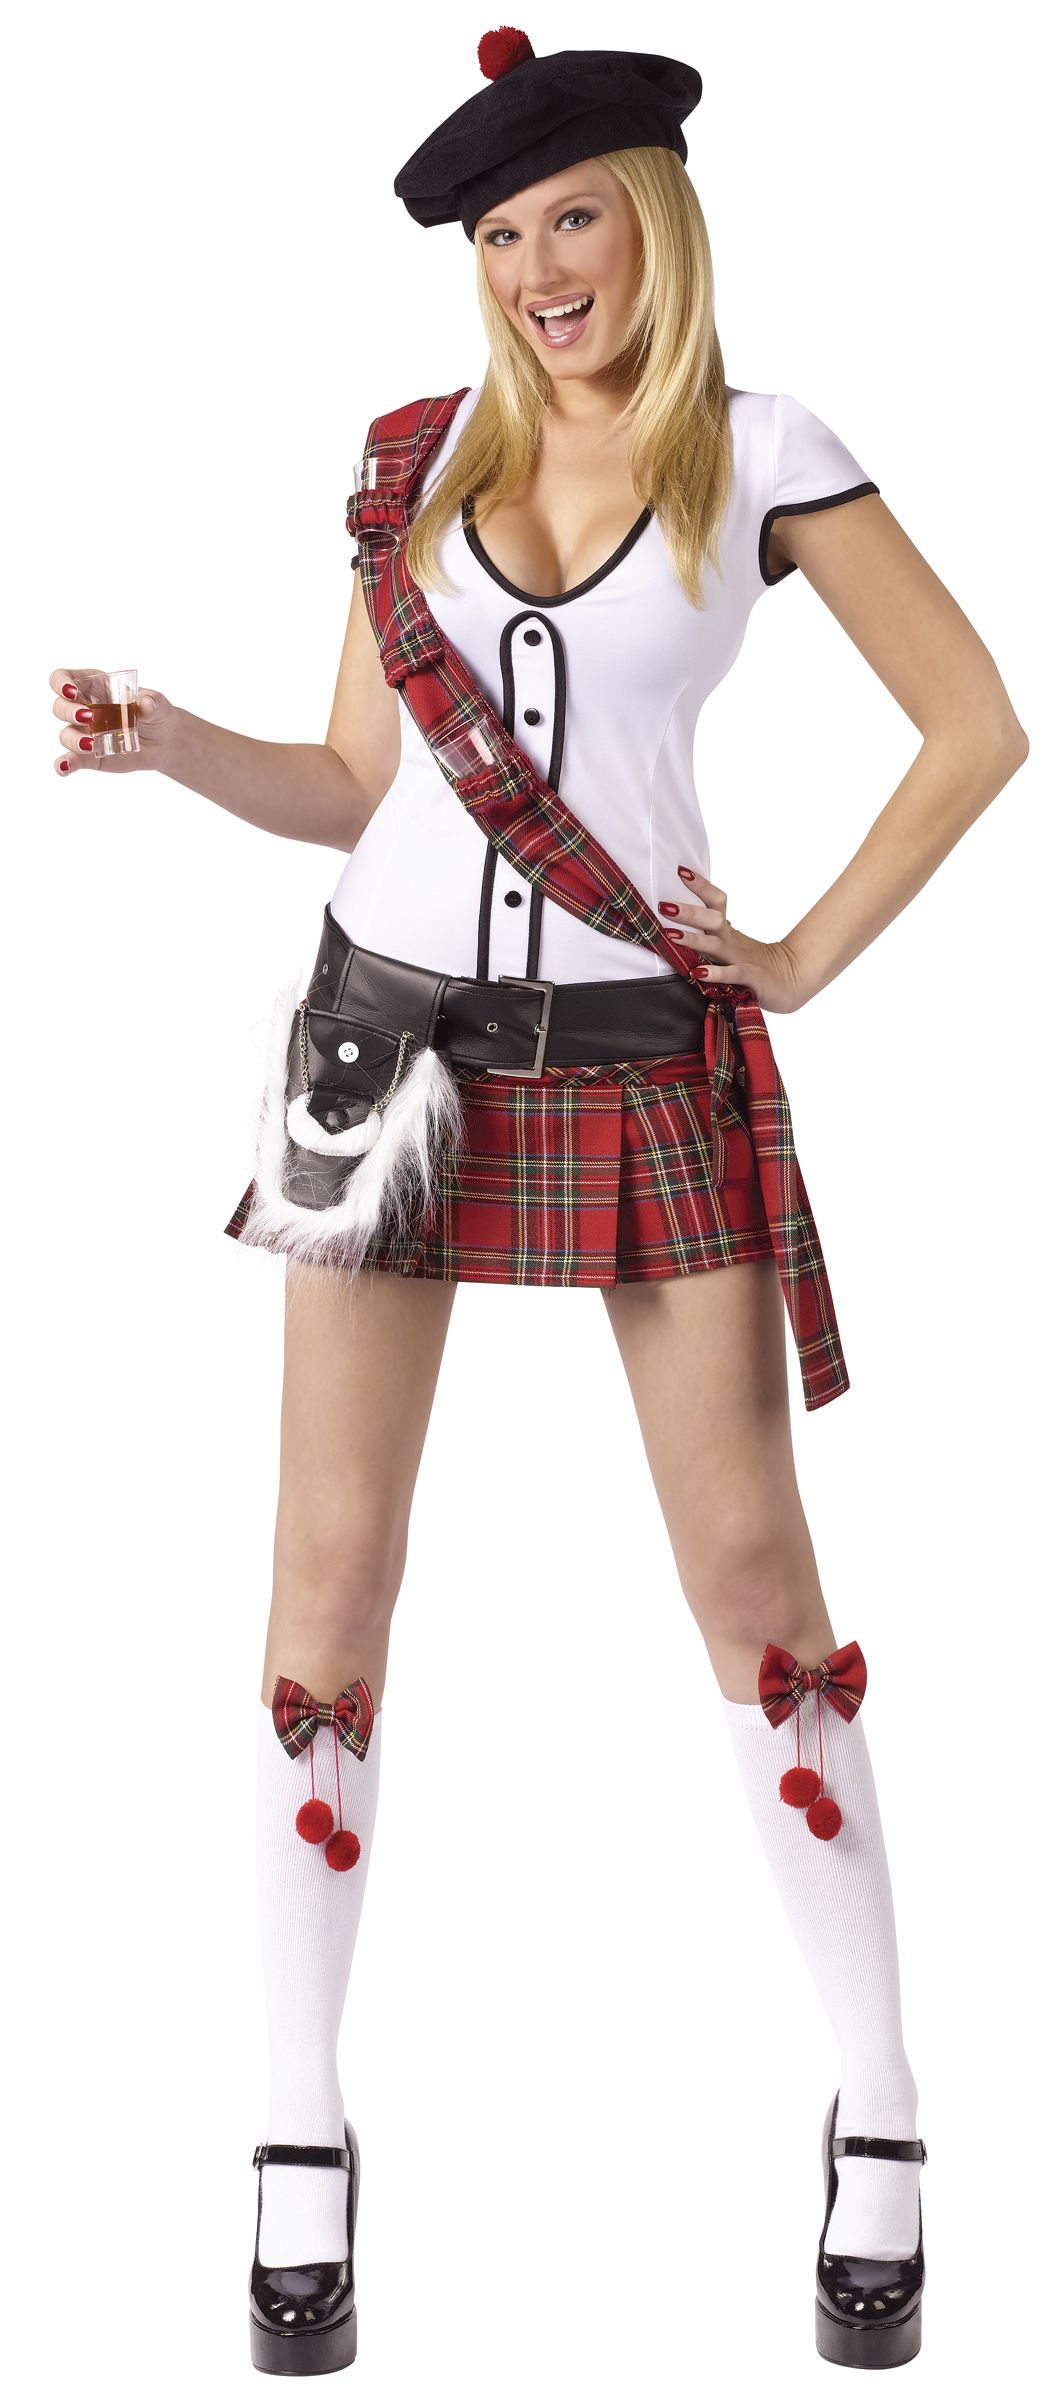 Stretchy Wedding Bands >> Sexy Scottish Tartan Lady   Scottish tartans, Scottish dress and Tartan